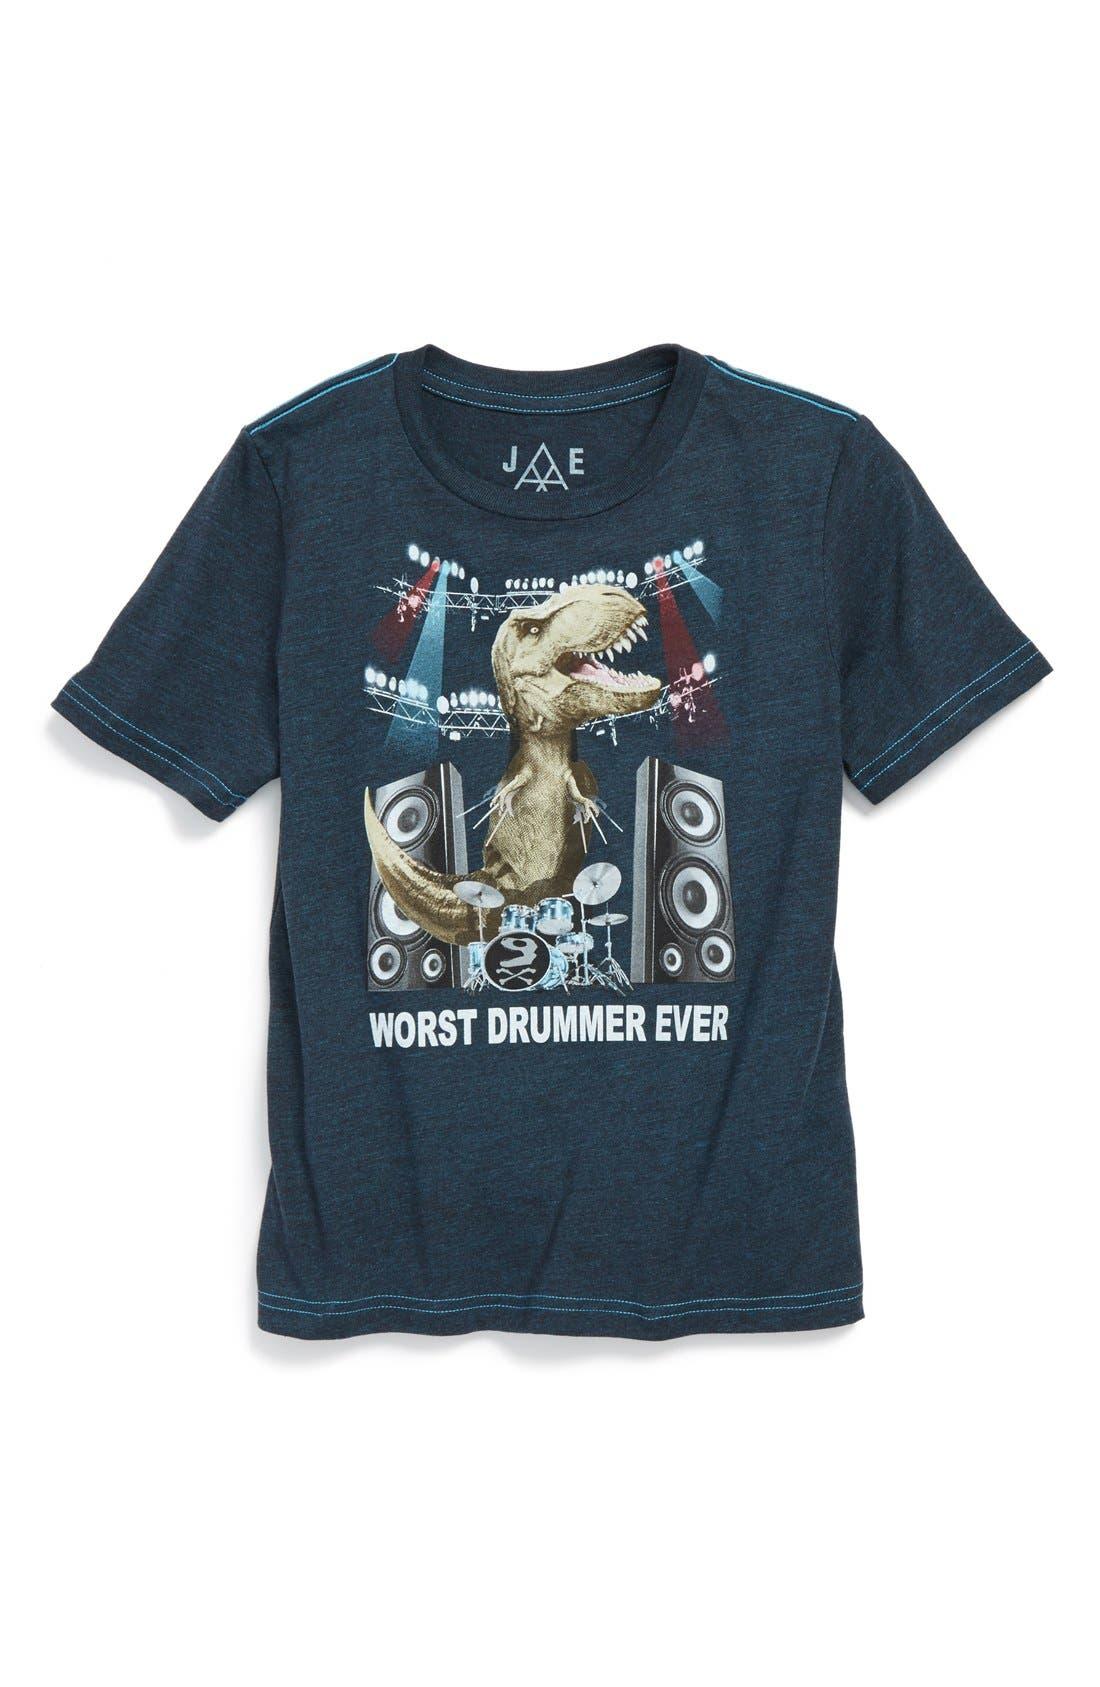 Main Image - Jem 'Worst Drummer Ever' Graphic Short Sleeve T-Shirt (Toddler Boys & Little Boys)